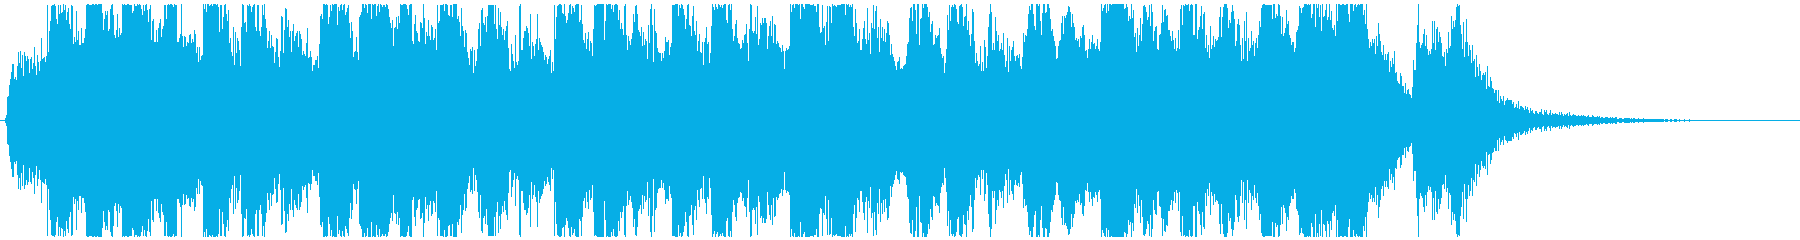 Halloween opening jingle's reproduced waveform